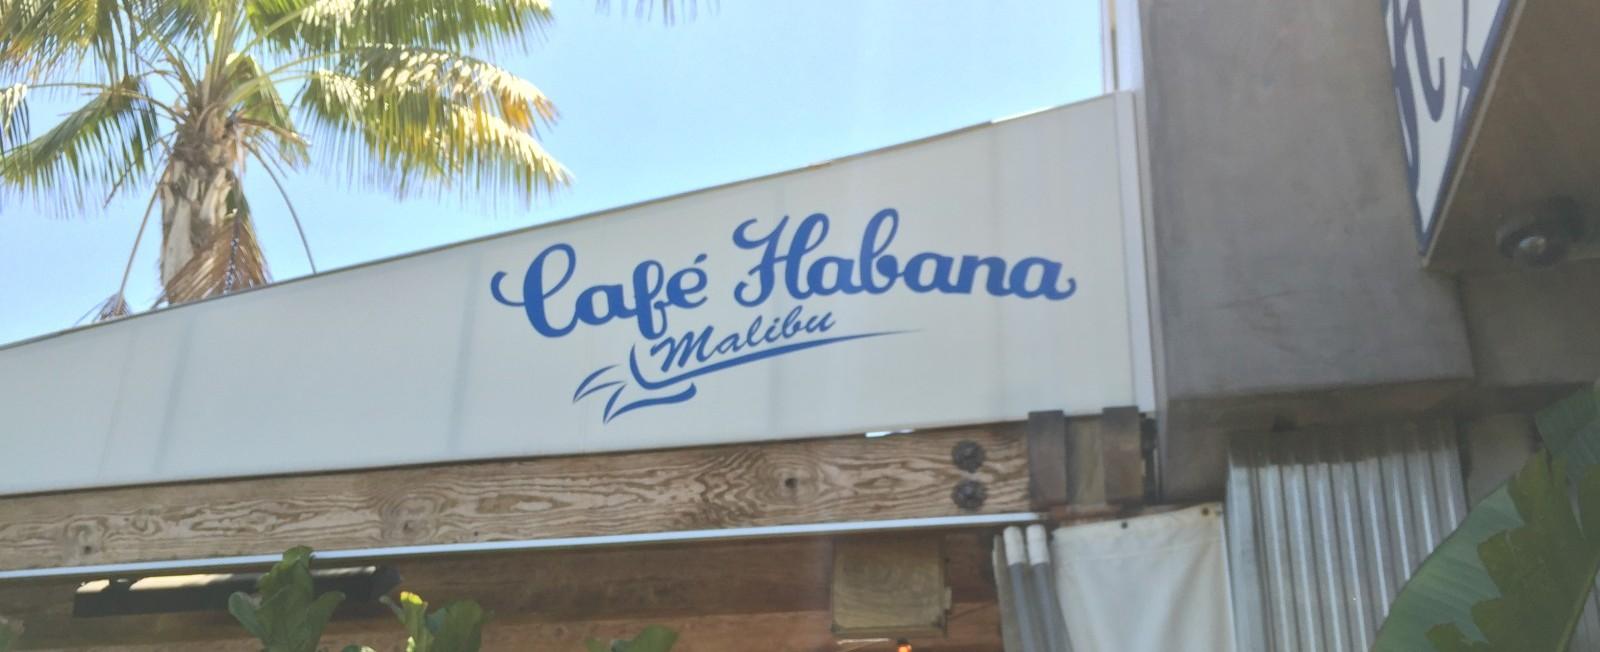 cafe-habana-restaurant_all-things-malibu